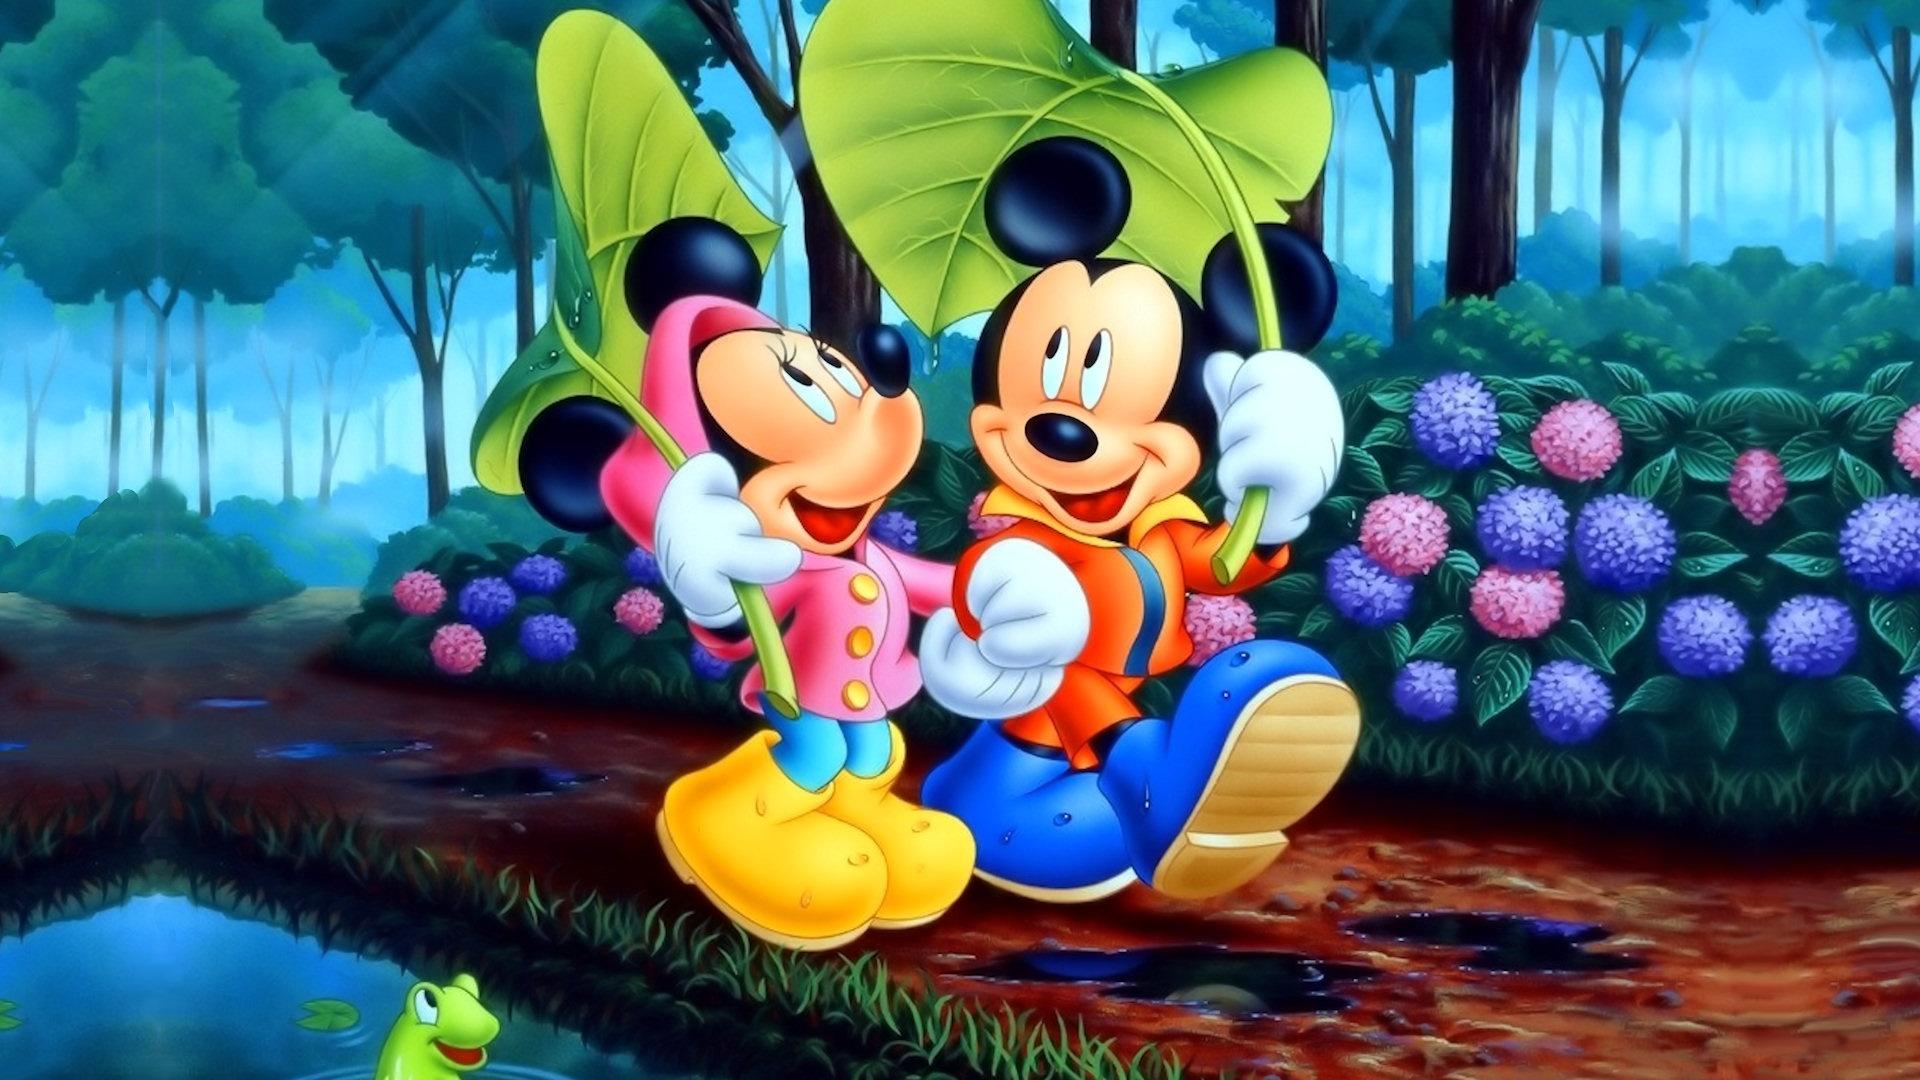 Disney Wallpaper Romantic wallpapers 1920 1080 Wallpapers 1920x1080